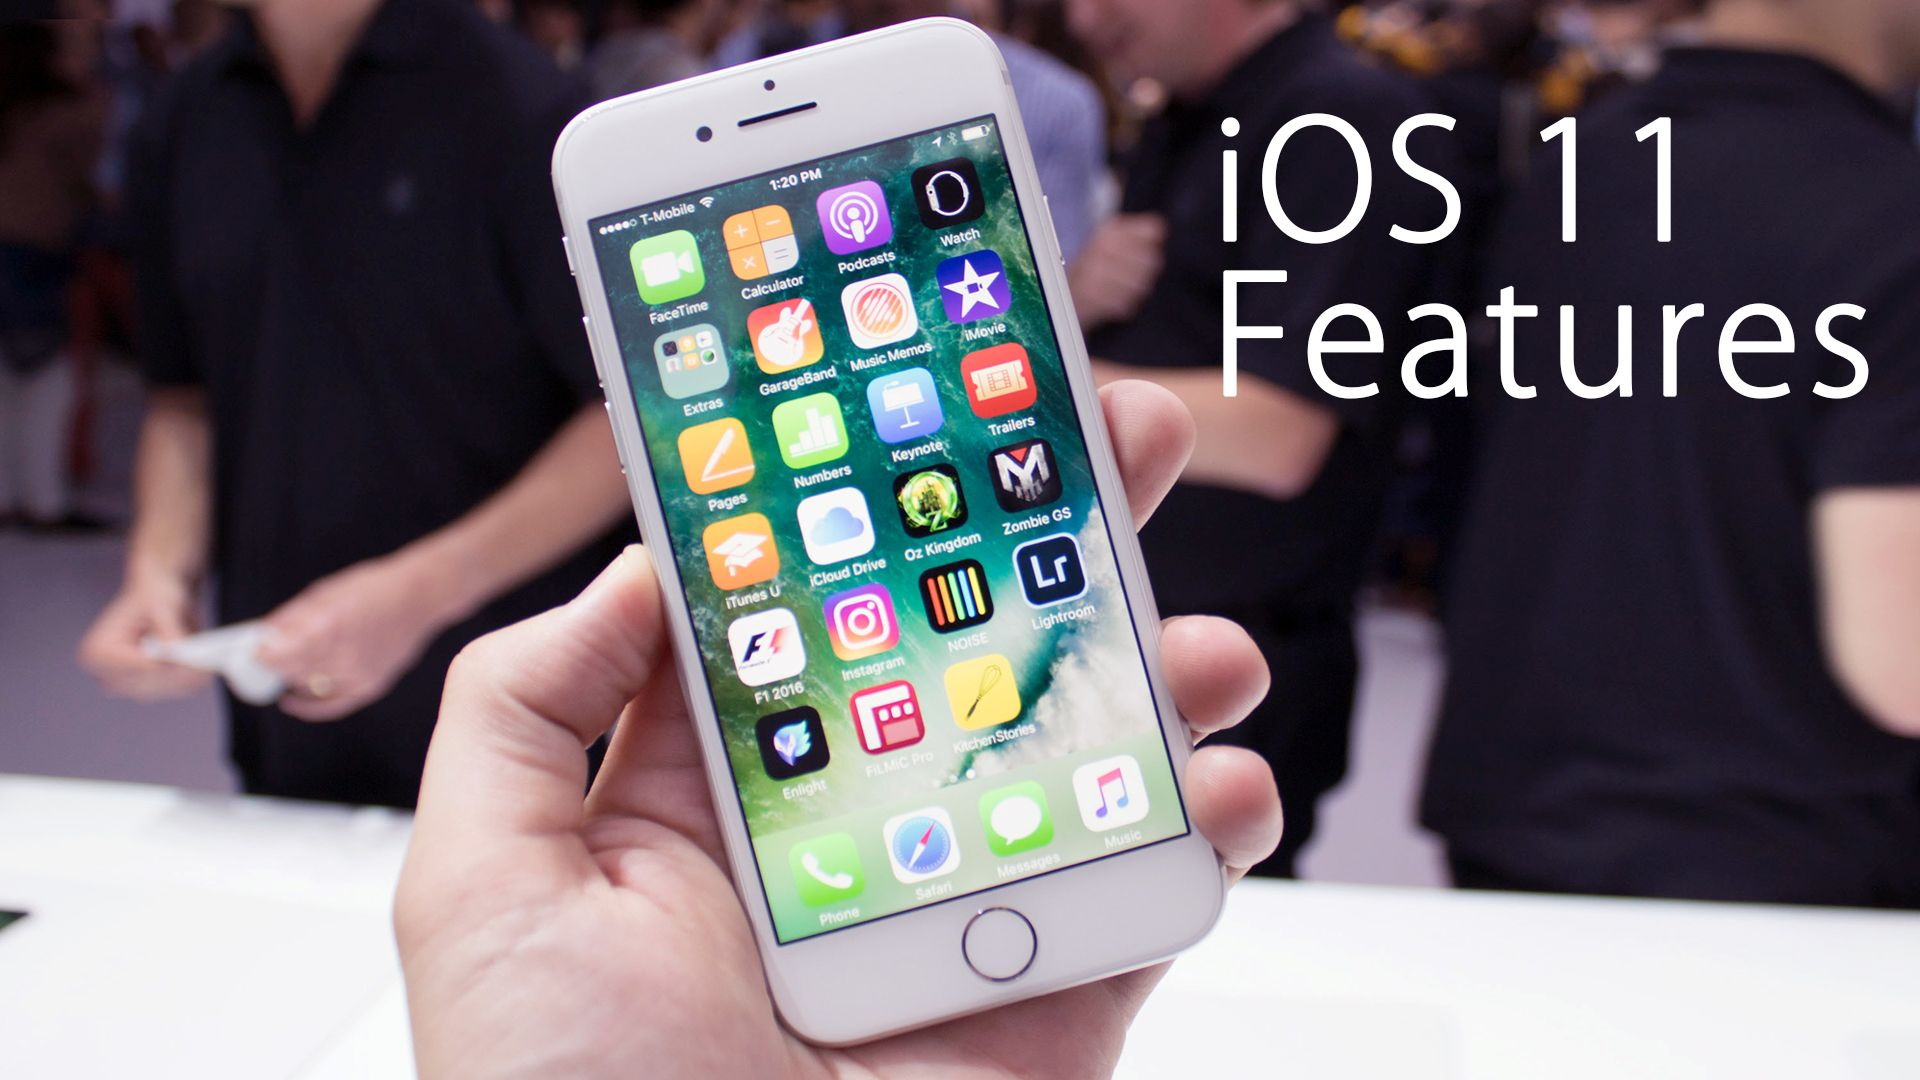 Ios11 features ios11 wwdc apple iphone https